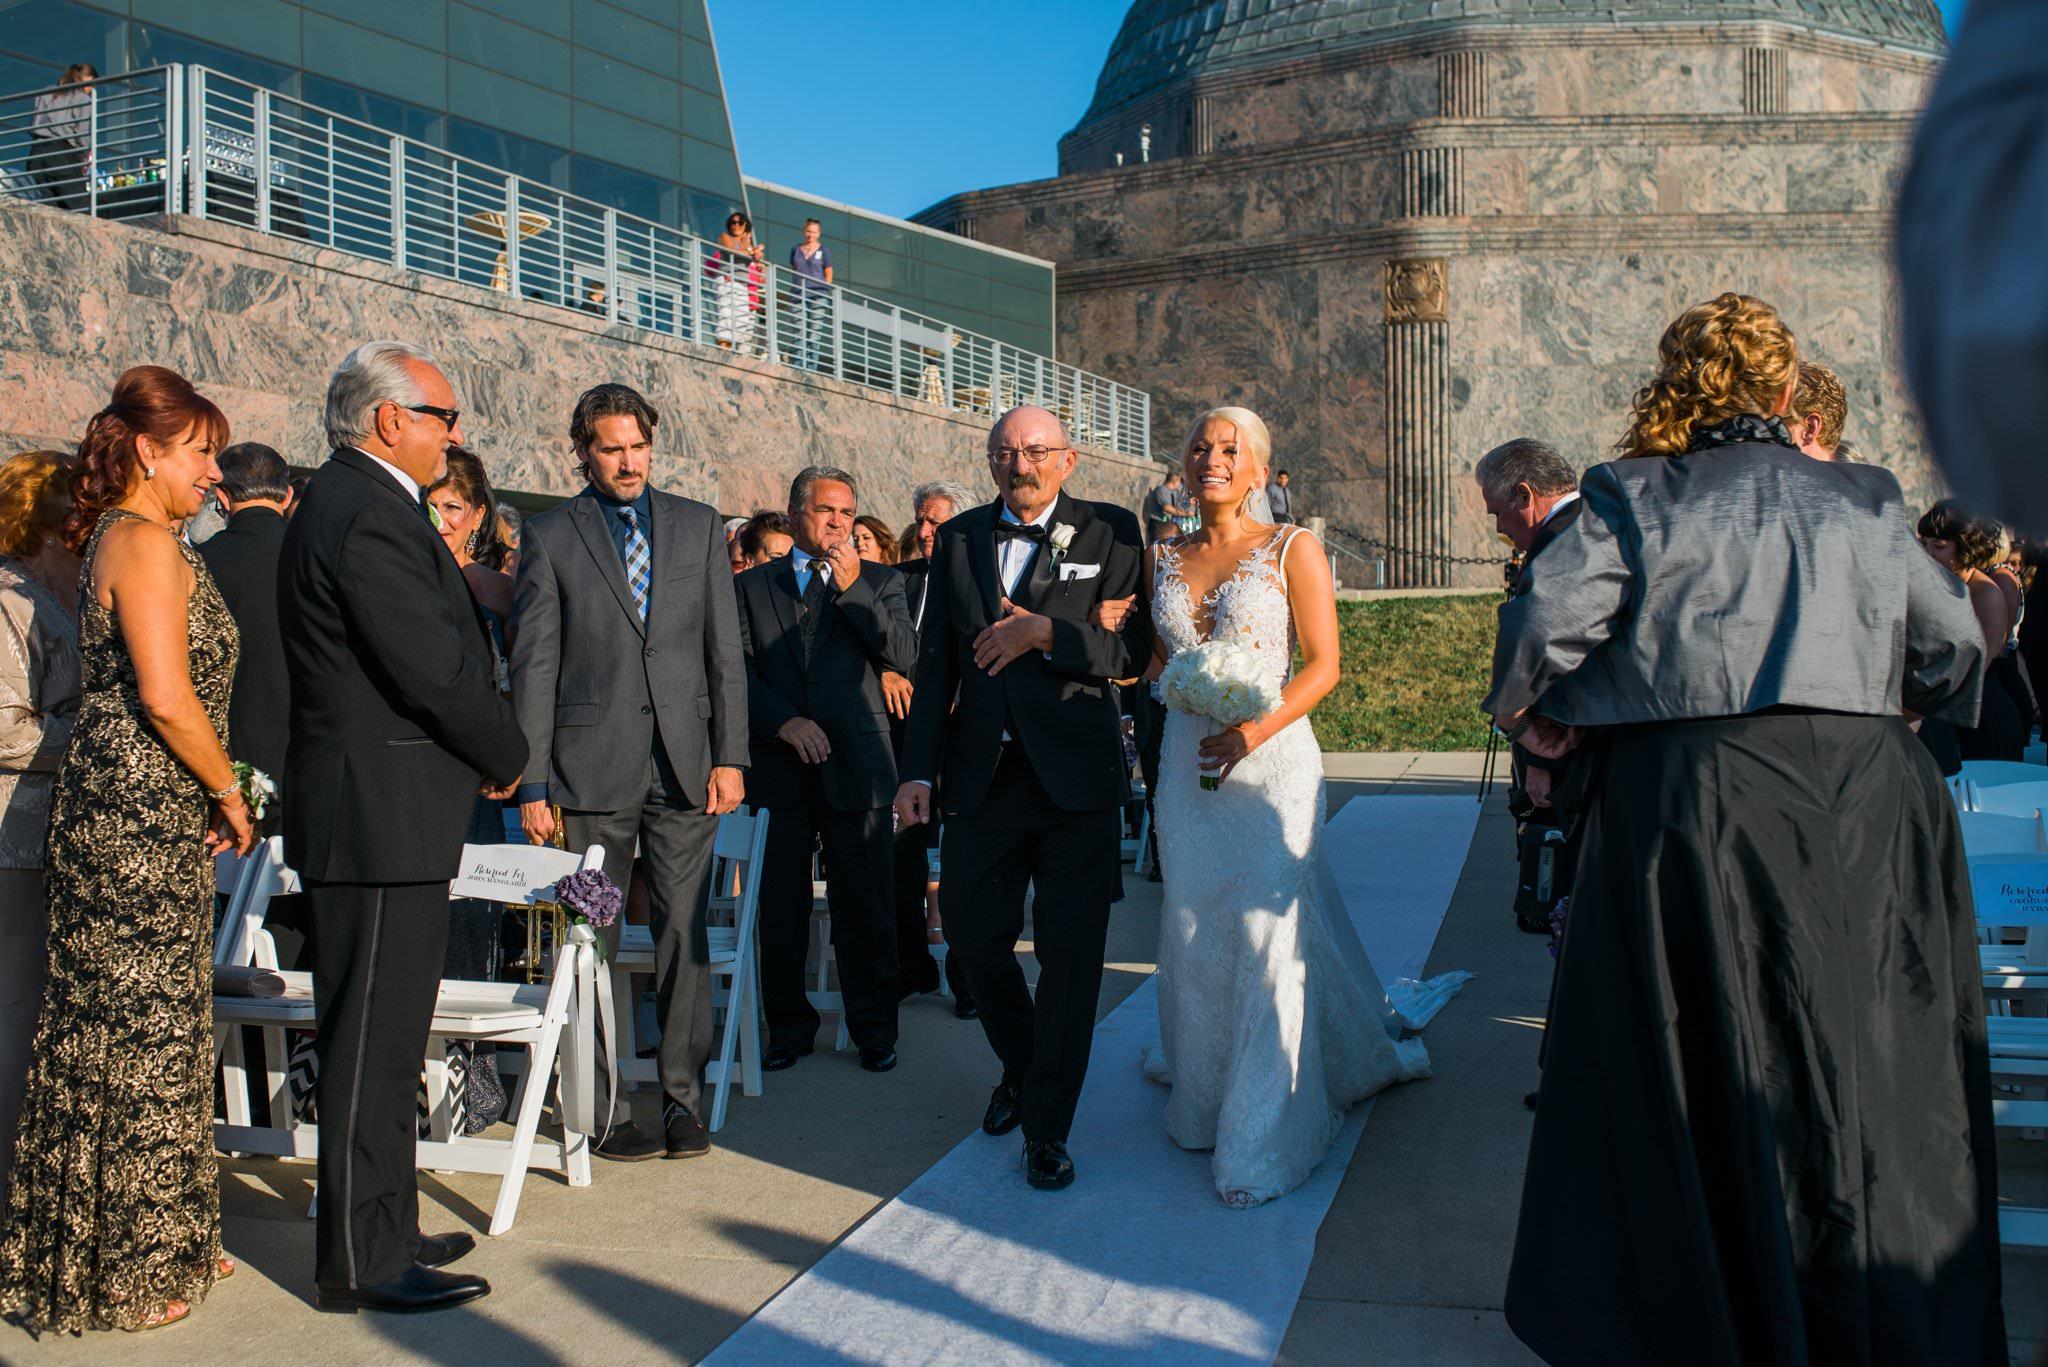 Adler-Planetarium-Chicago-Wedding-Photography-0056.JPG